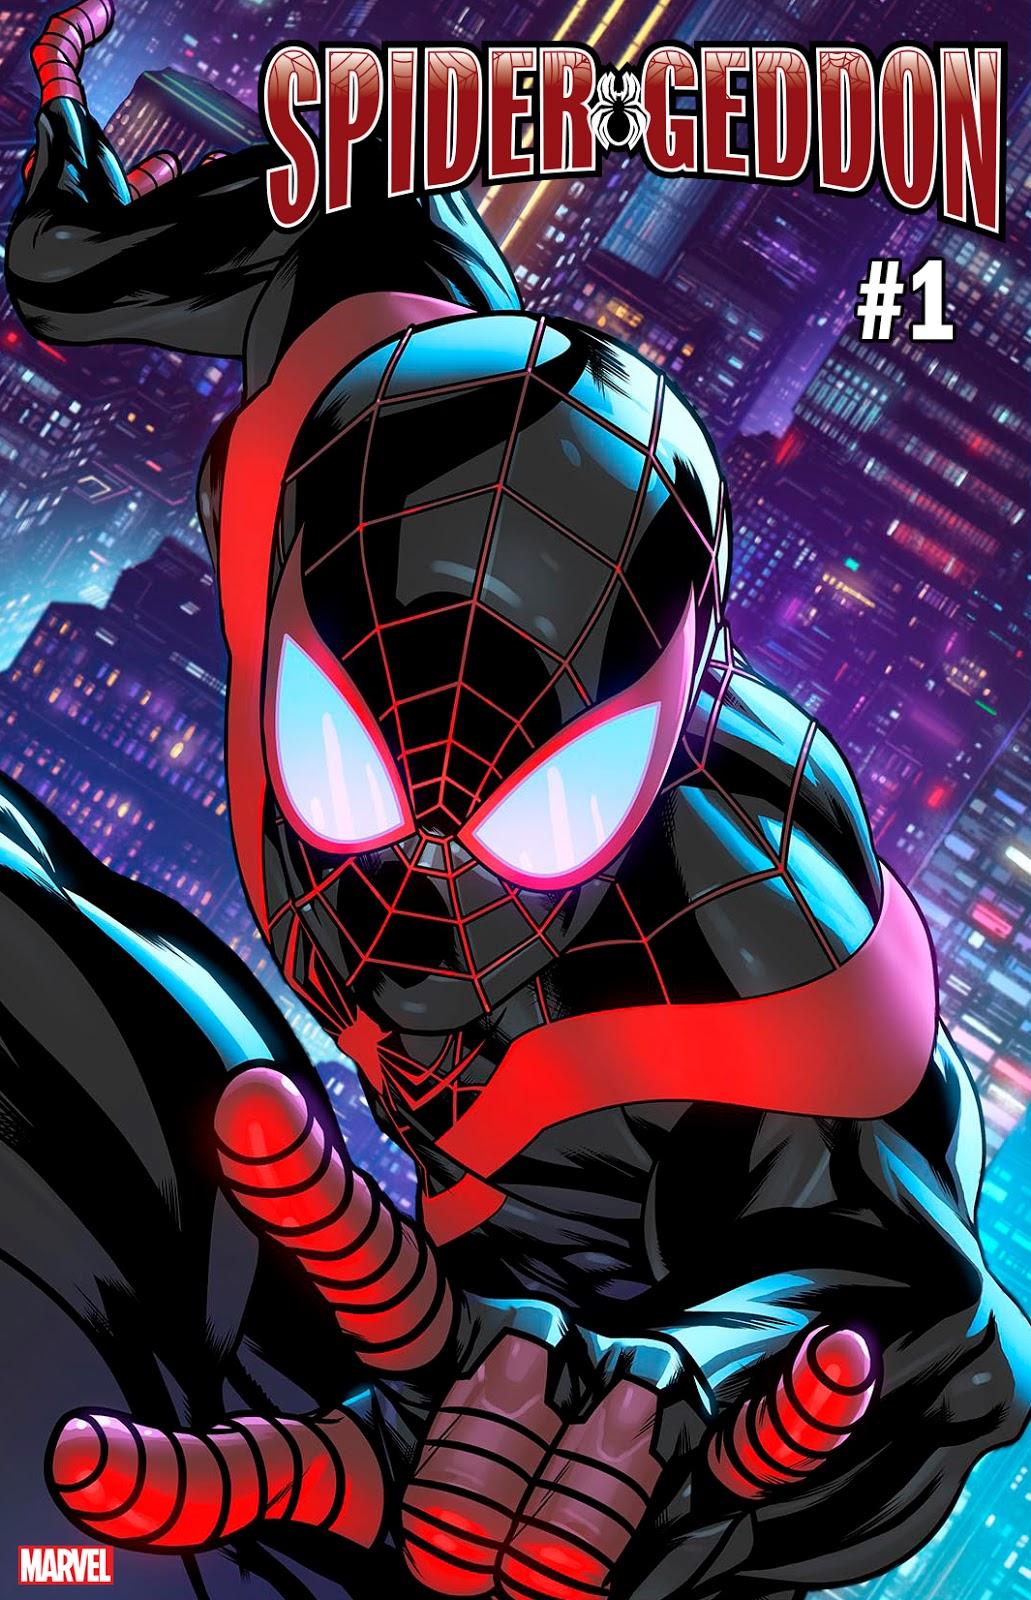 Marvel Comics 2018 NYCC Previews Spider-Geddon # 1 Jorge Molina Variant